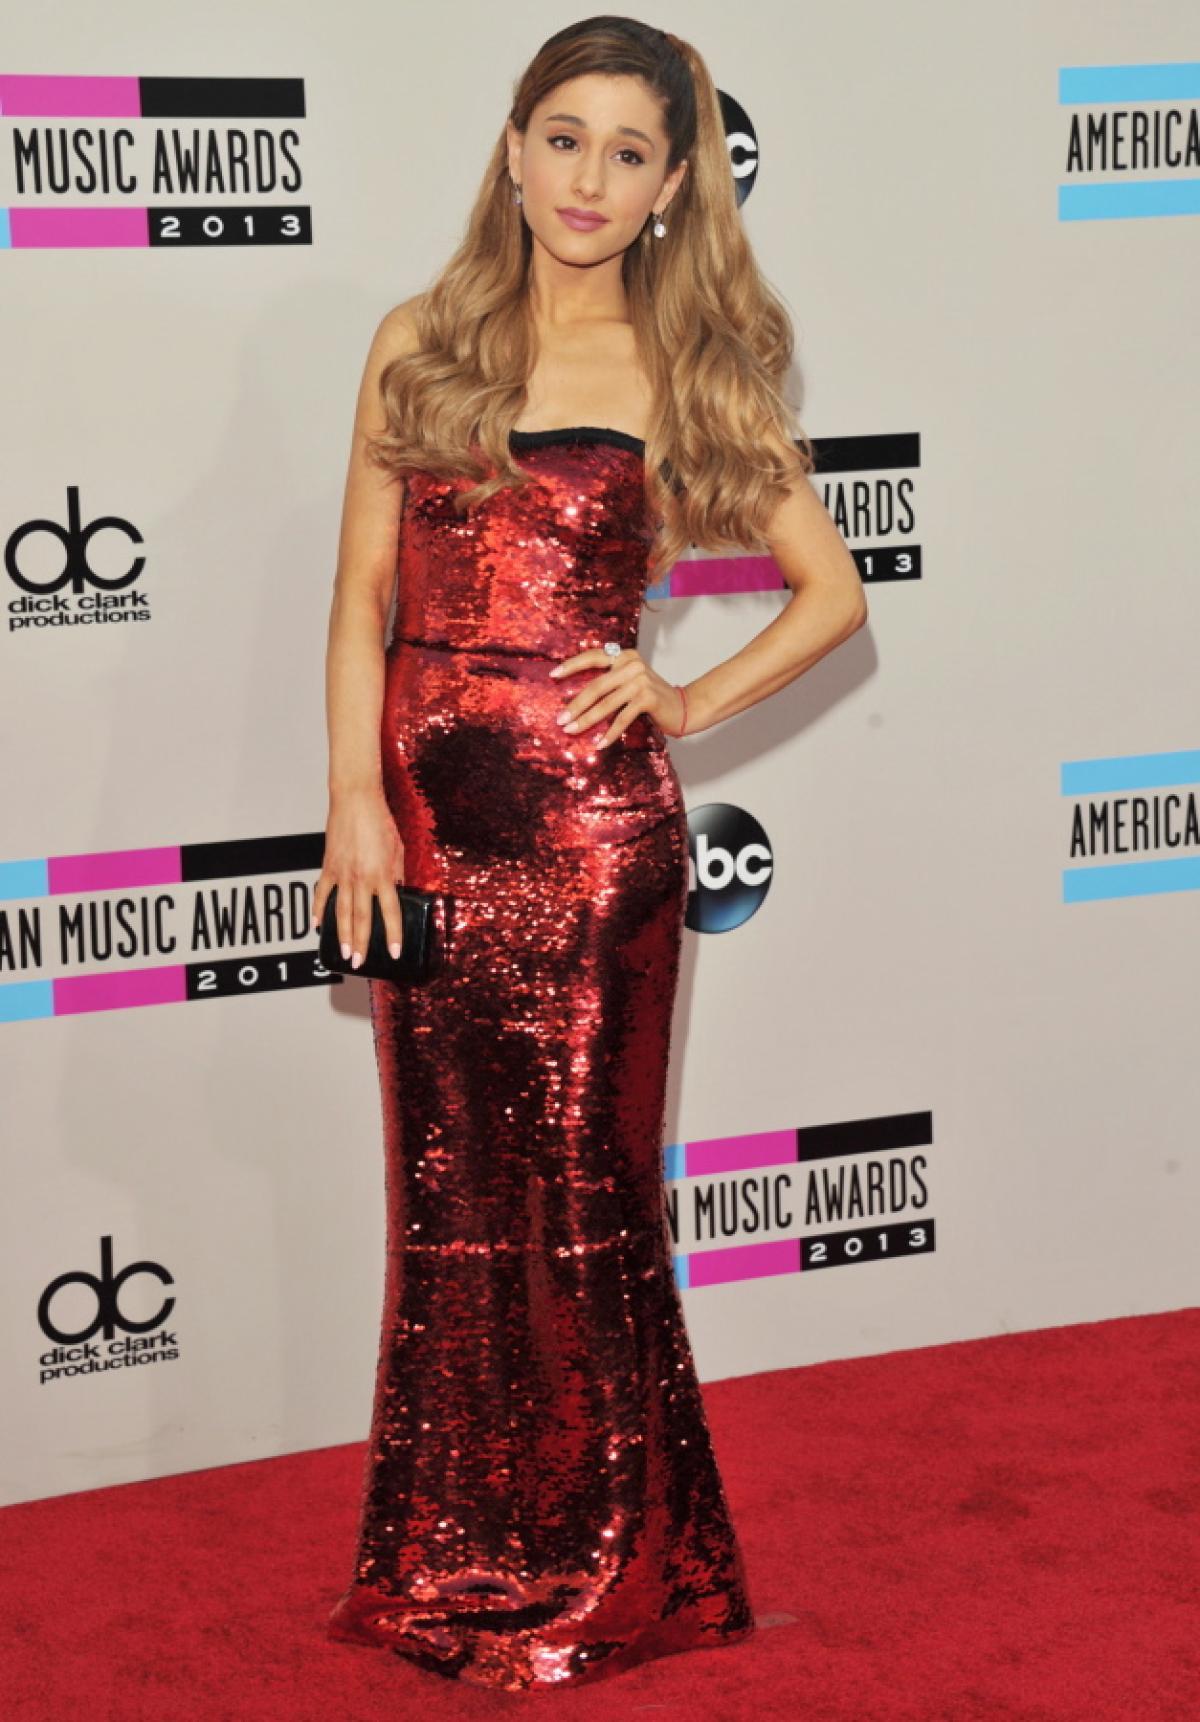 Ariana Grande - Red Carpet Fashion Awards